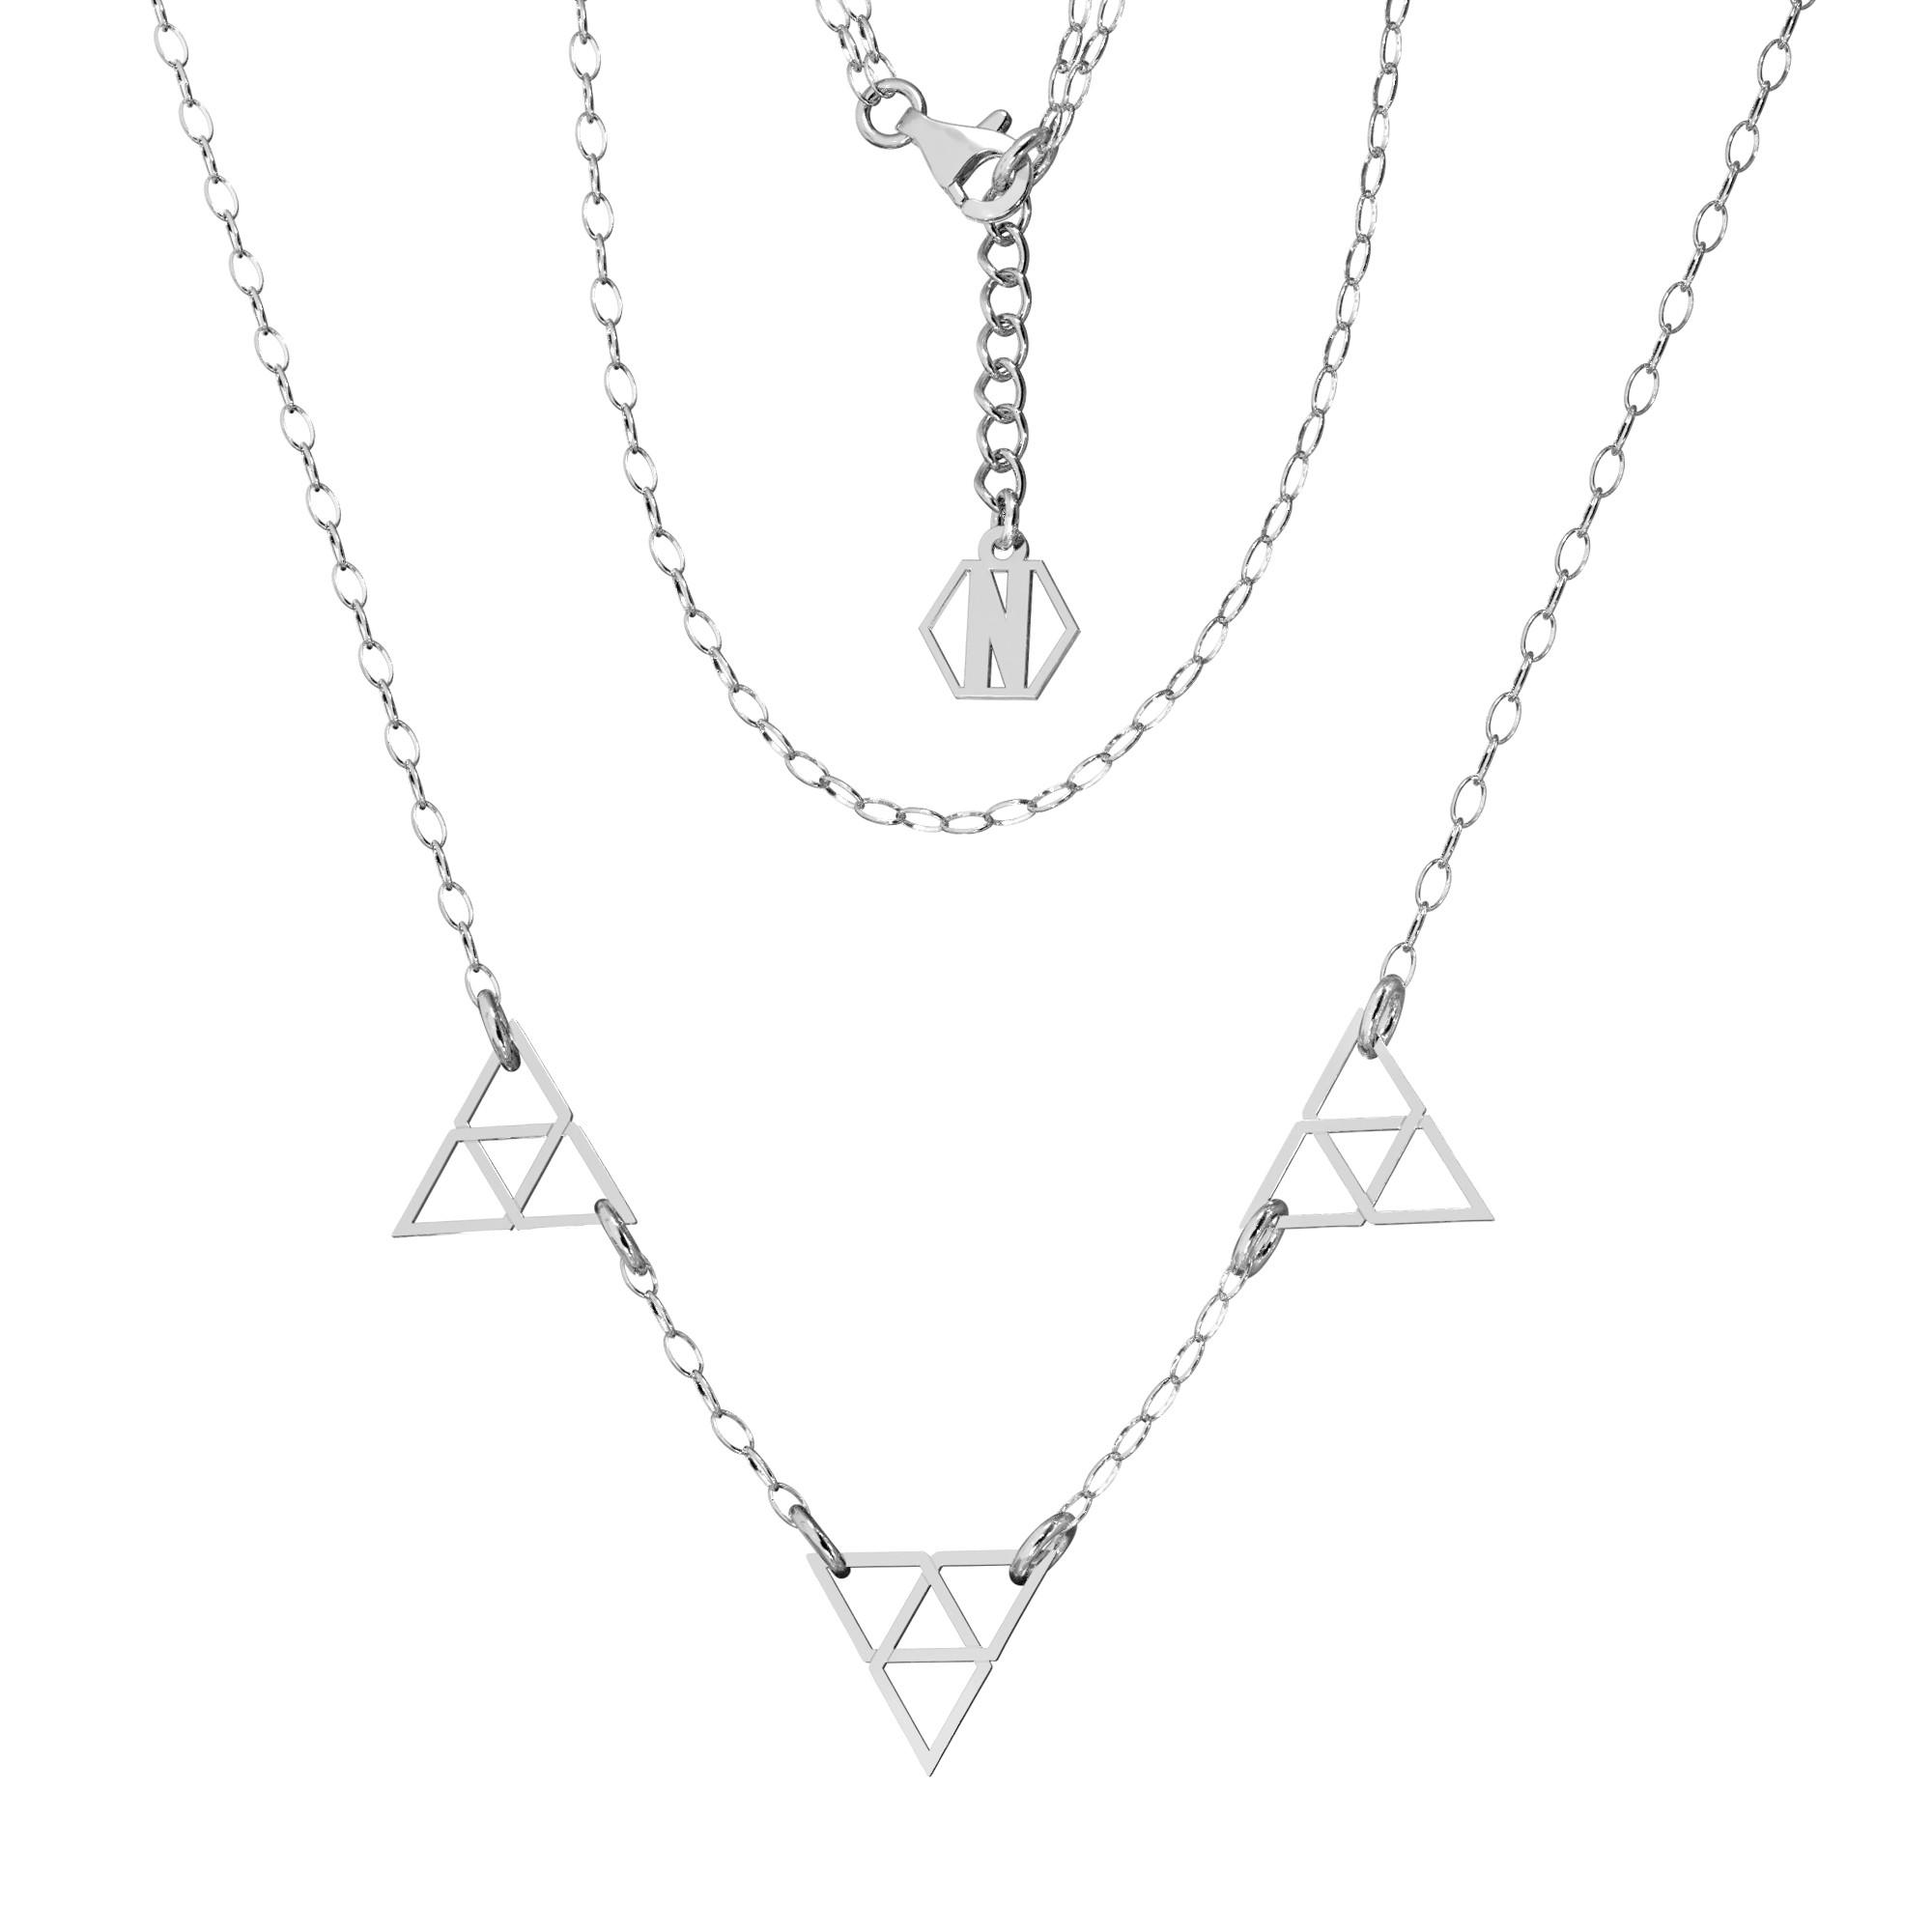 Srebrny naszyjnik trójkąty srebro 925, Nikki Lund